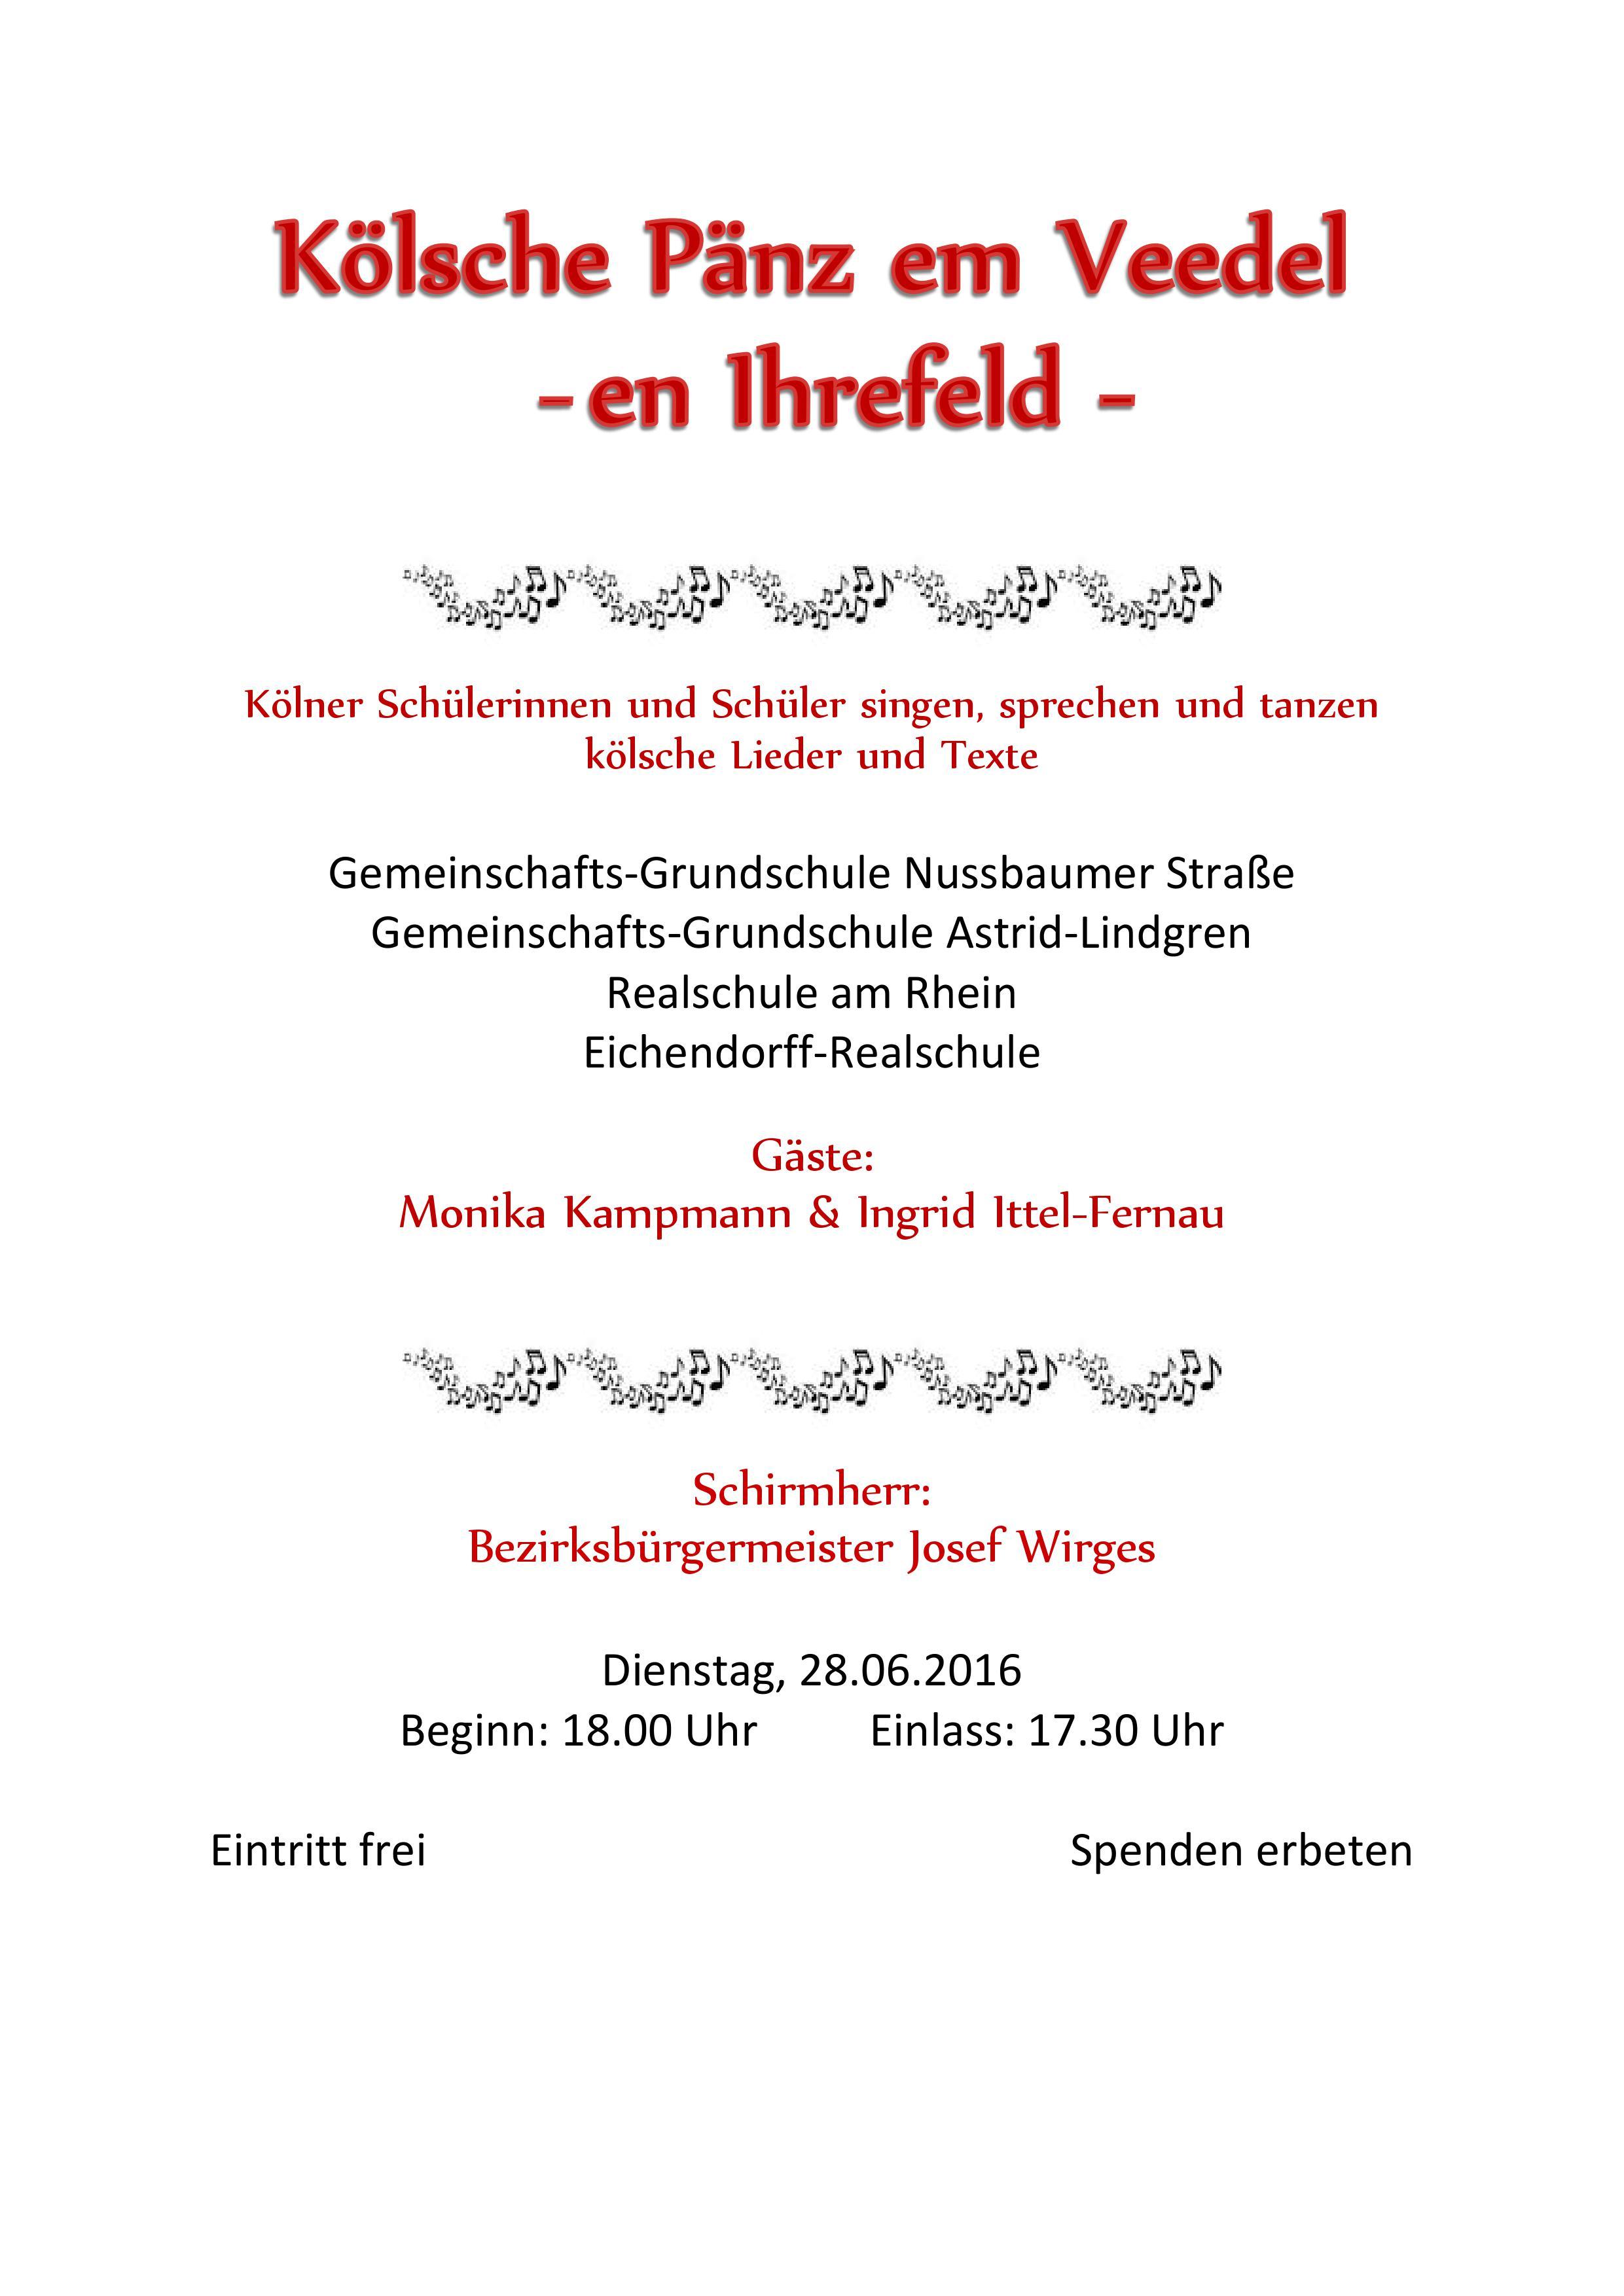 Kölsche Pänz em Veedel – 28.06.2016 18 Uhr